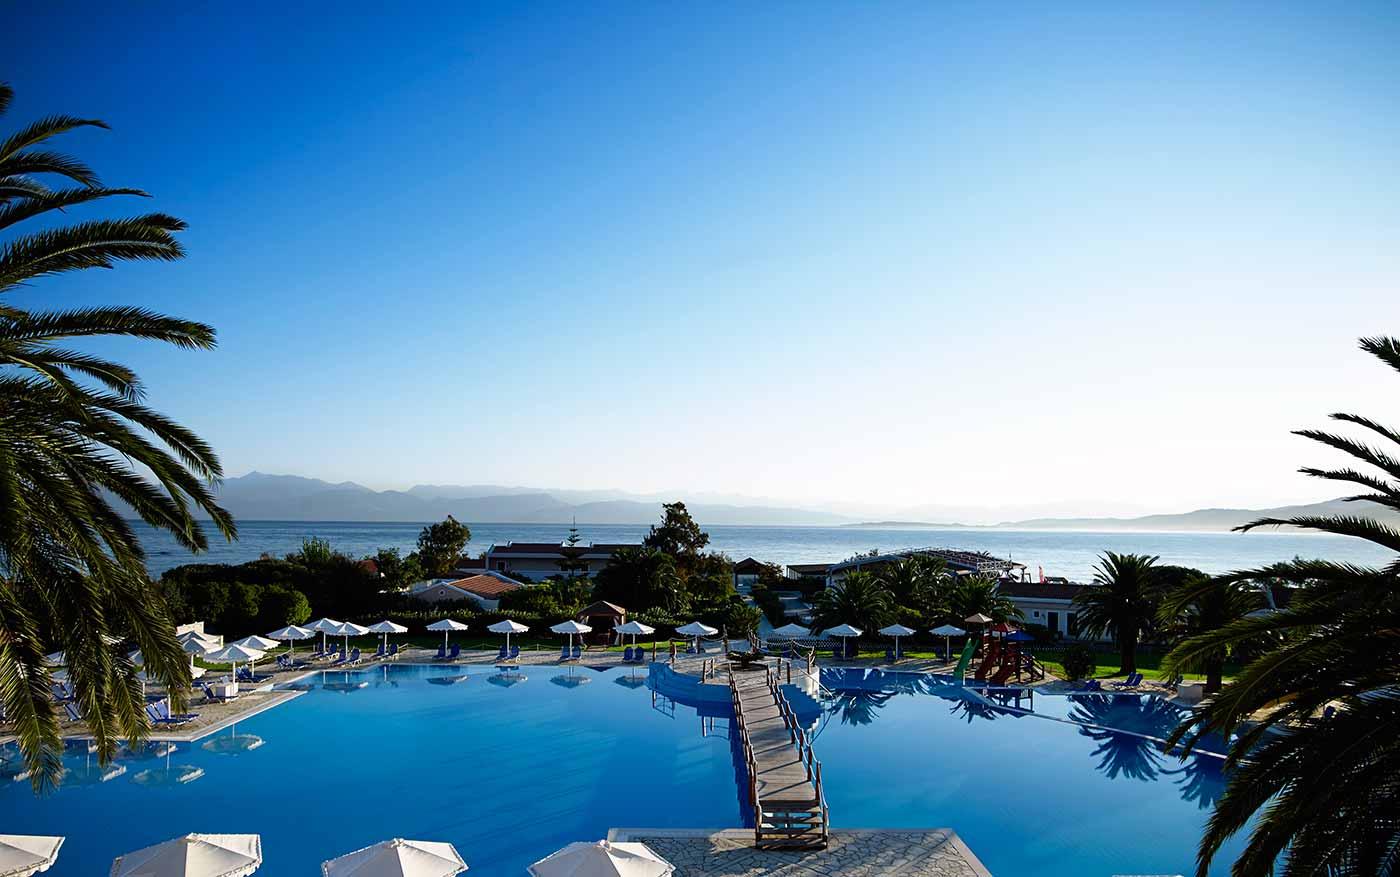 Roda beach resort and Spa, Corfu island, Greece   Niakas Travel